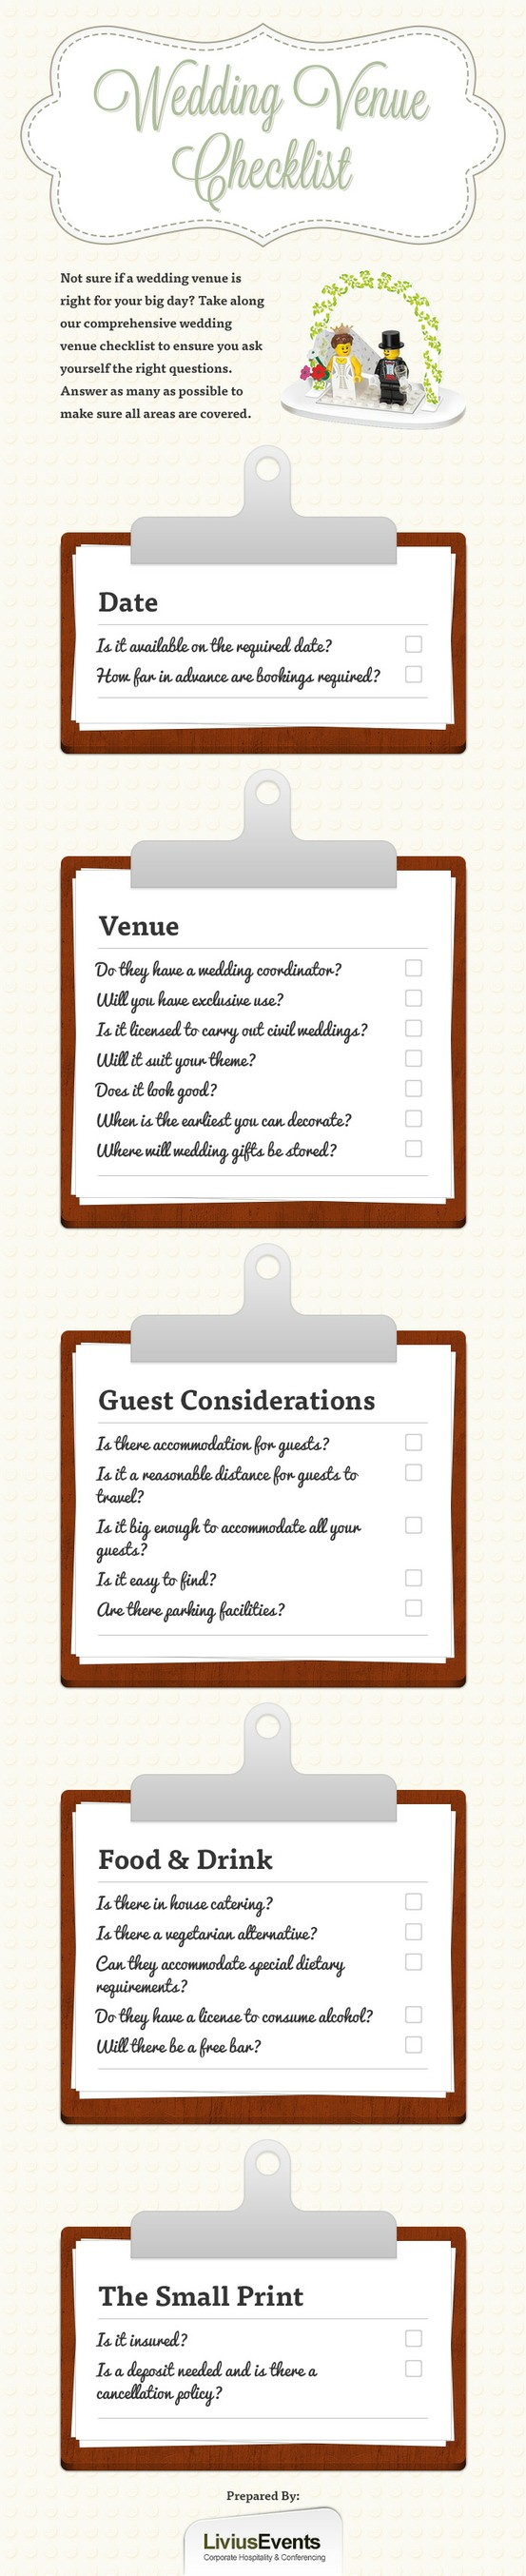 Important venue checklist | Wedding infographic, Wedding ...